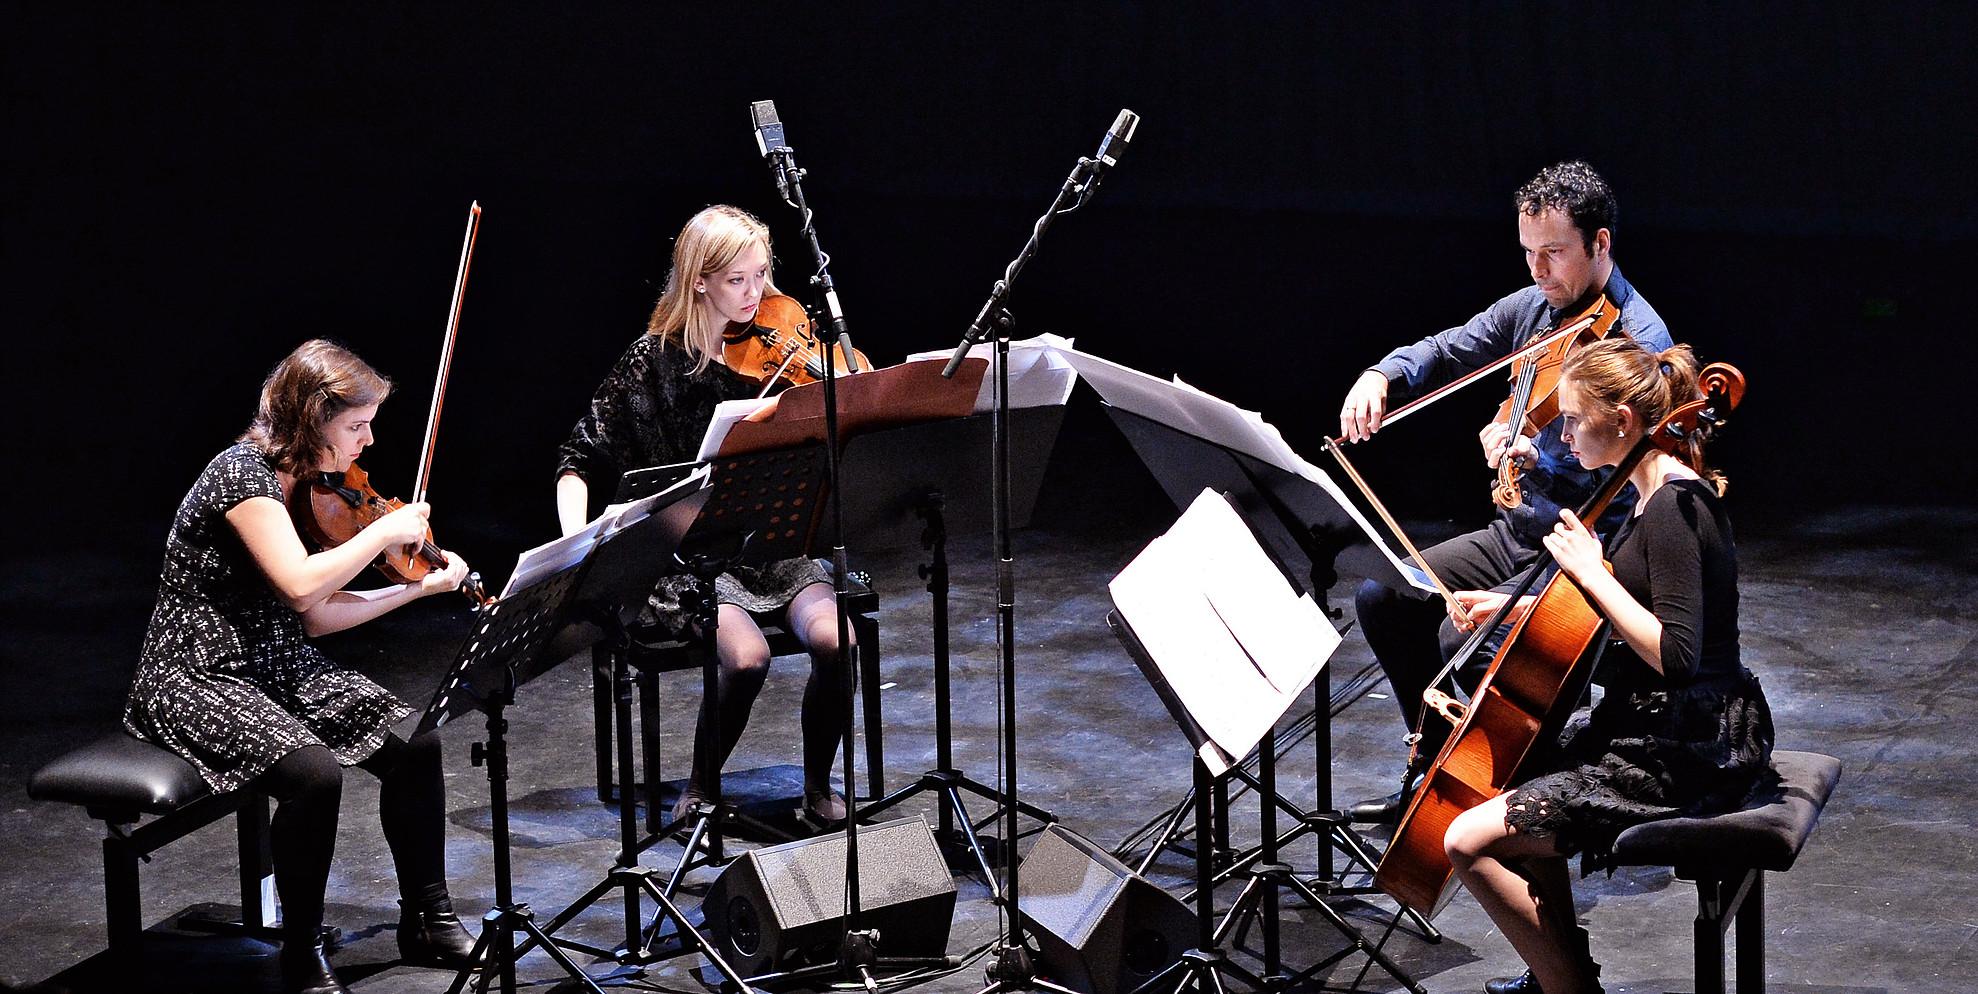 2017 Ensembles in Residence/Solistas & Conjuntos de Residencia